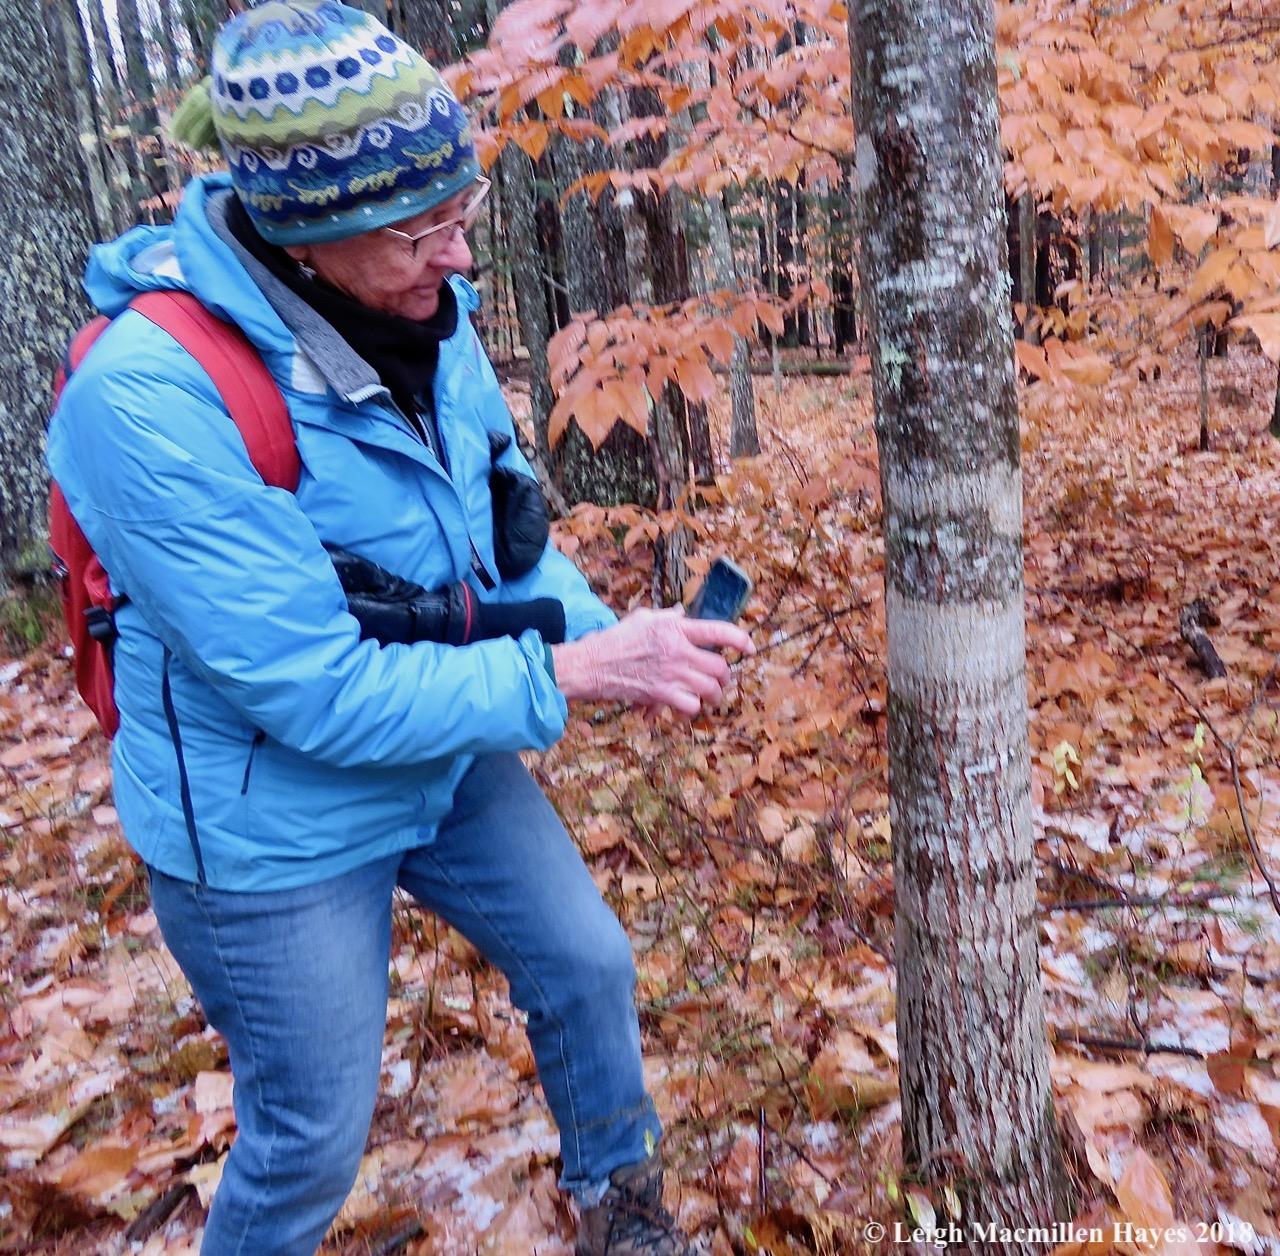 11a-JoAnne photographing script lichen